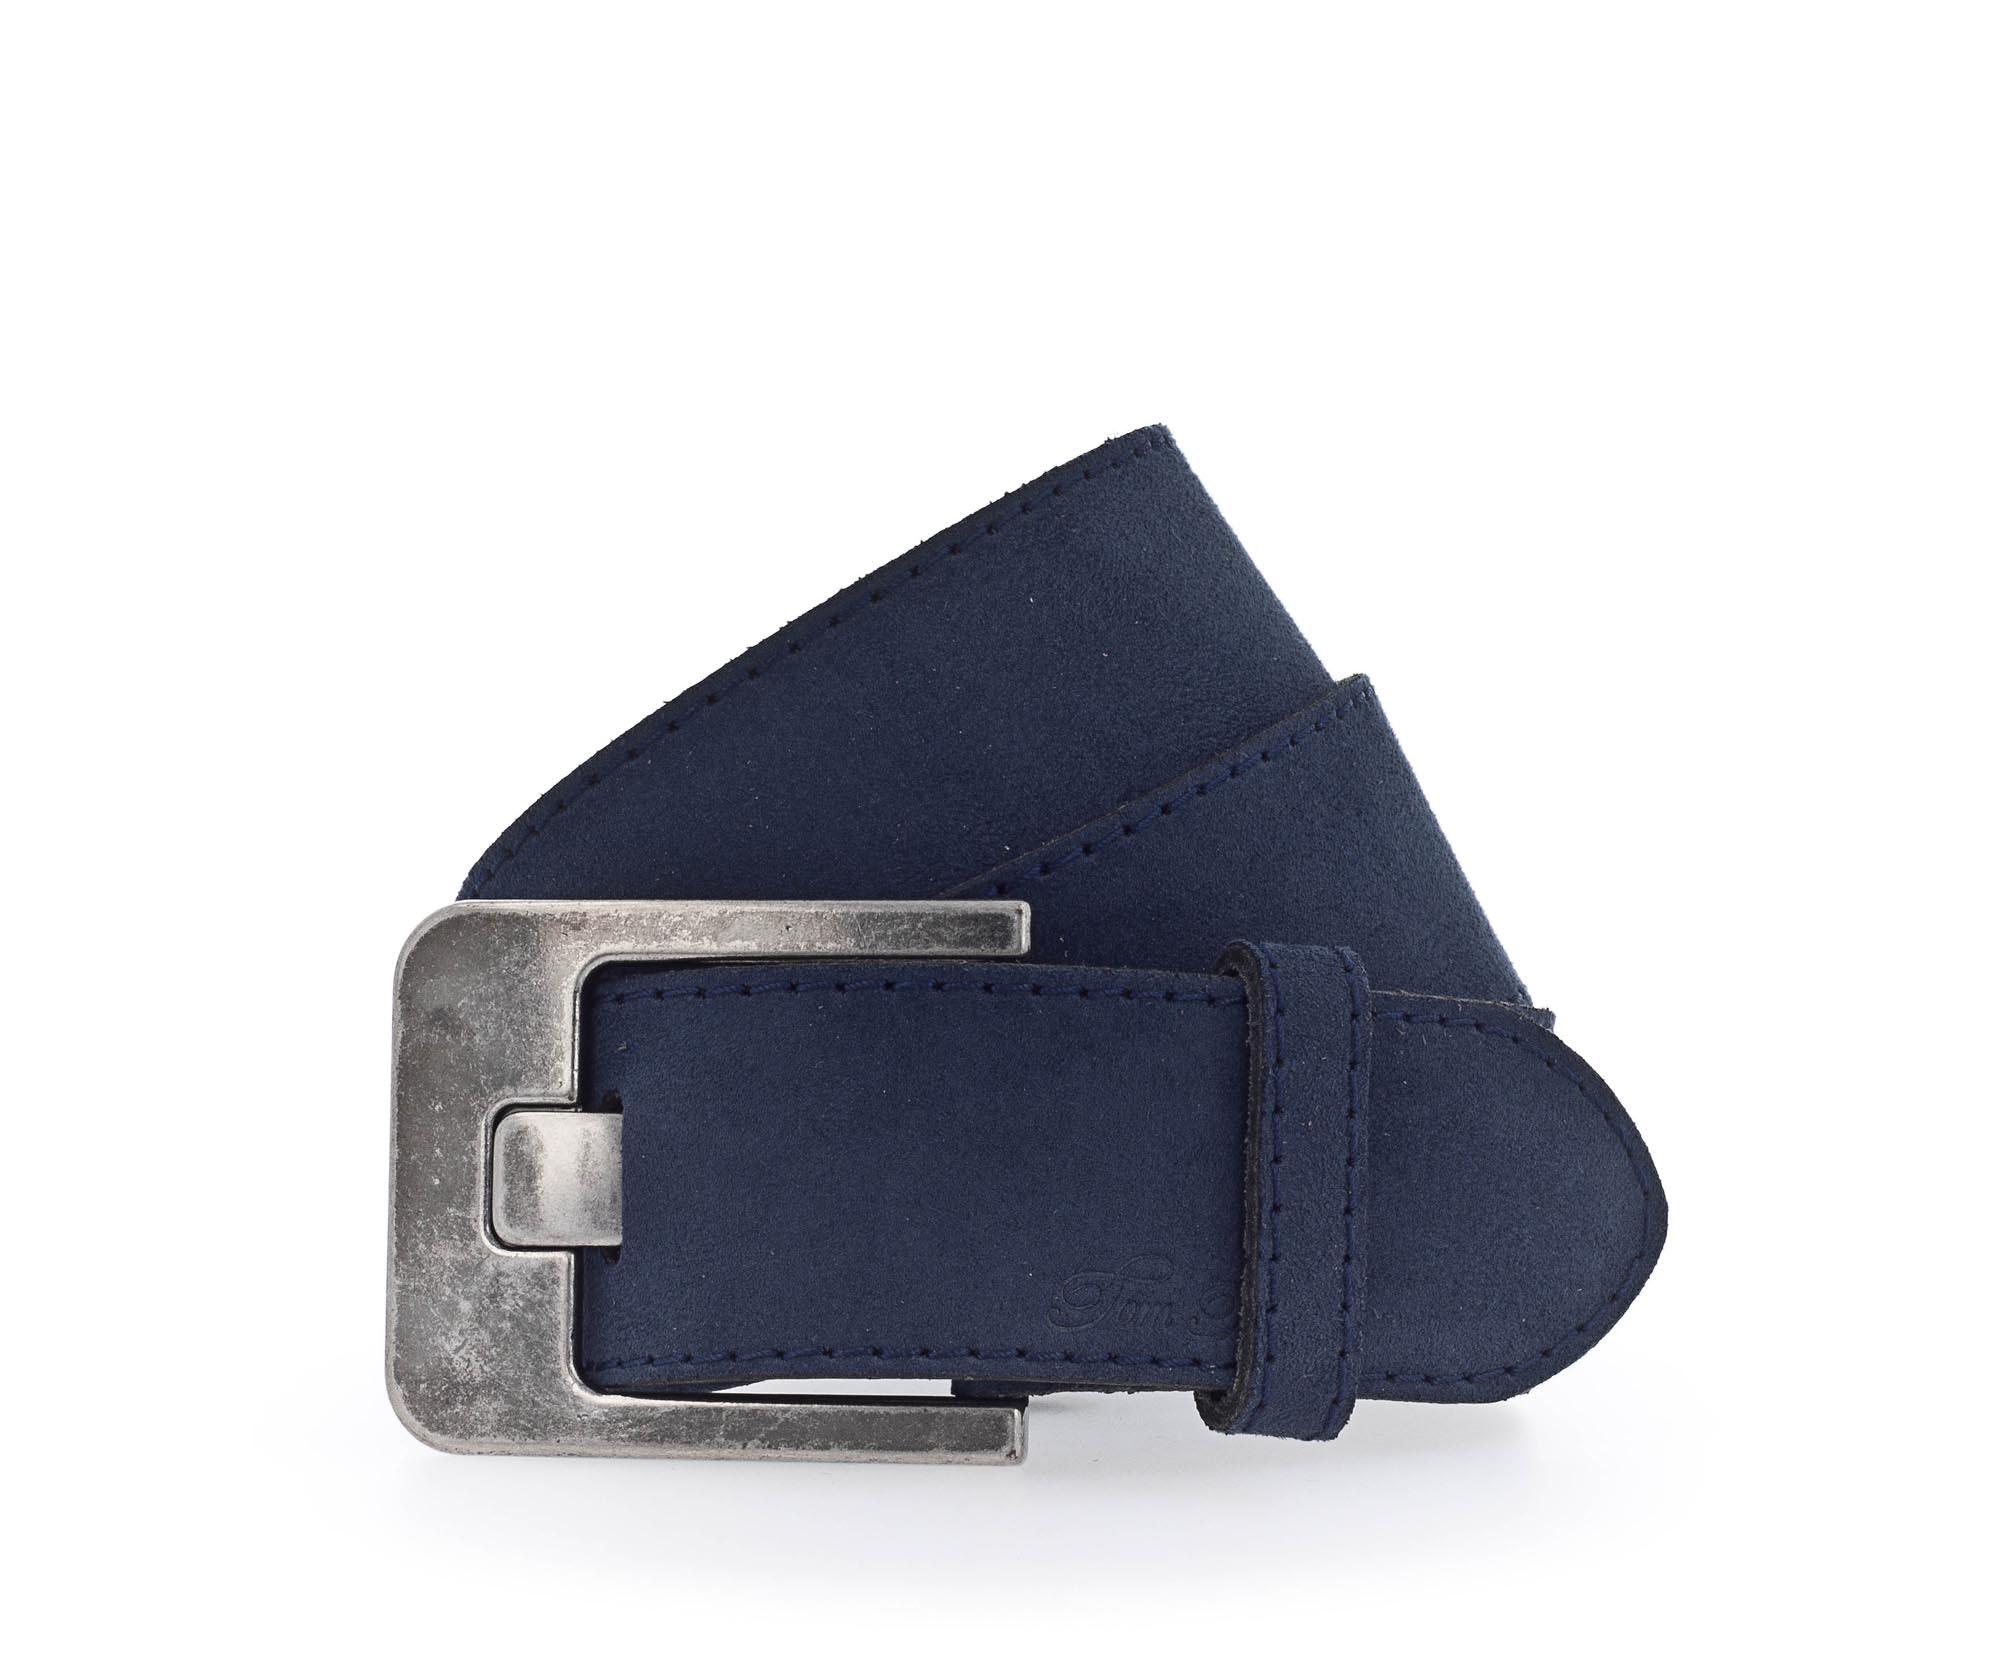 40mm Gürtel Q. 6309, blau